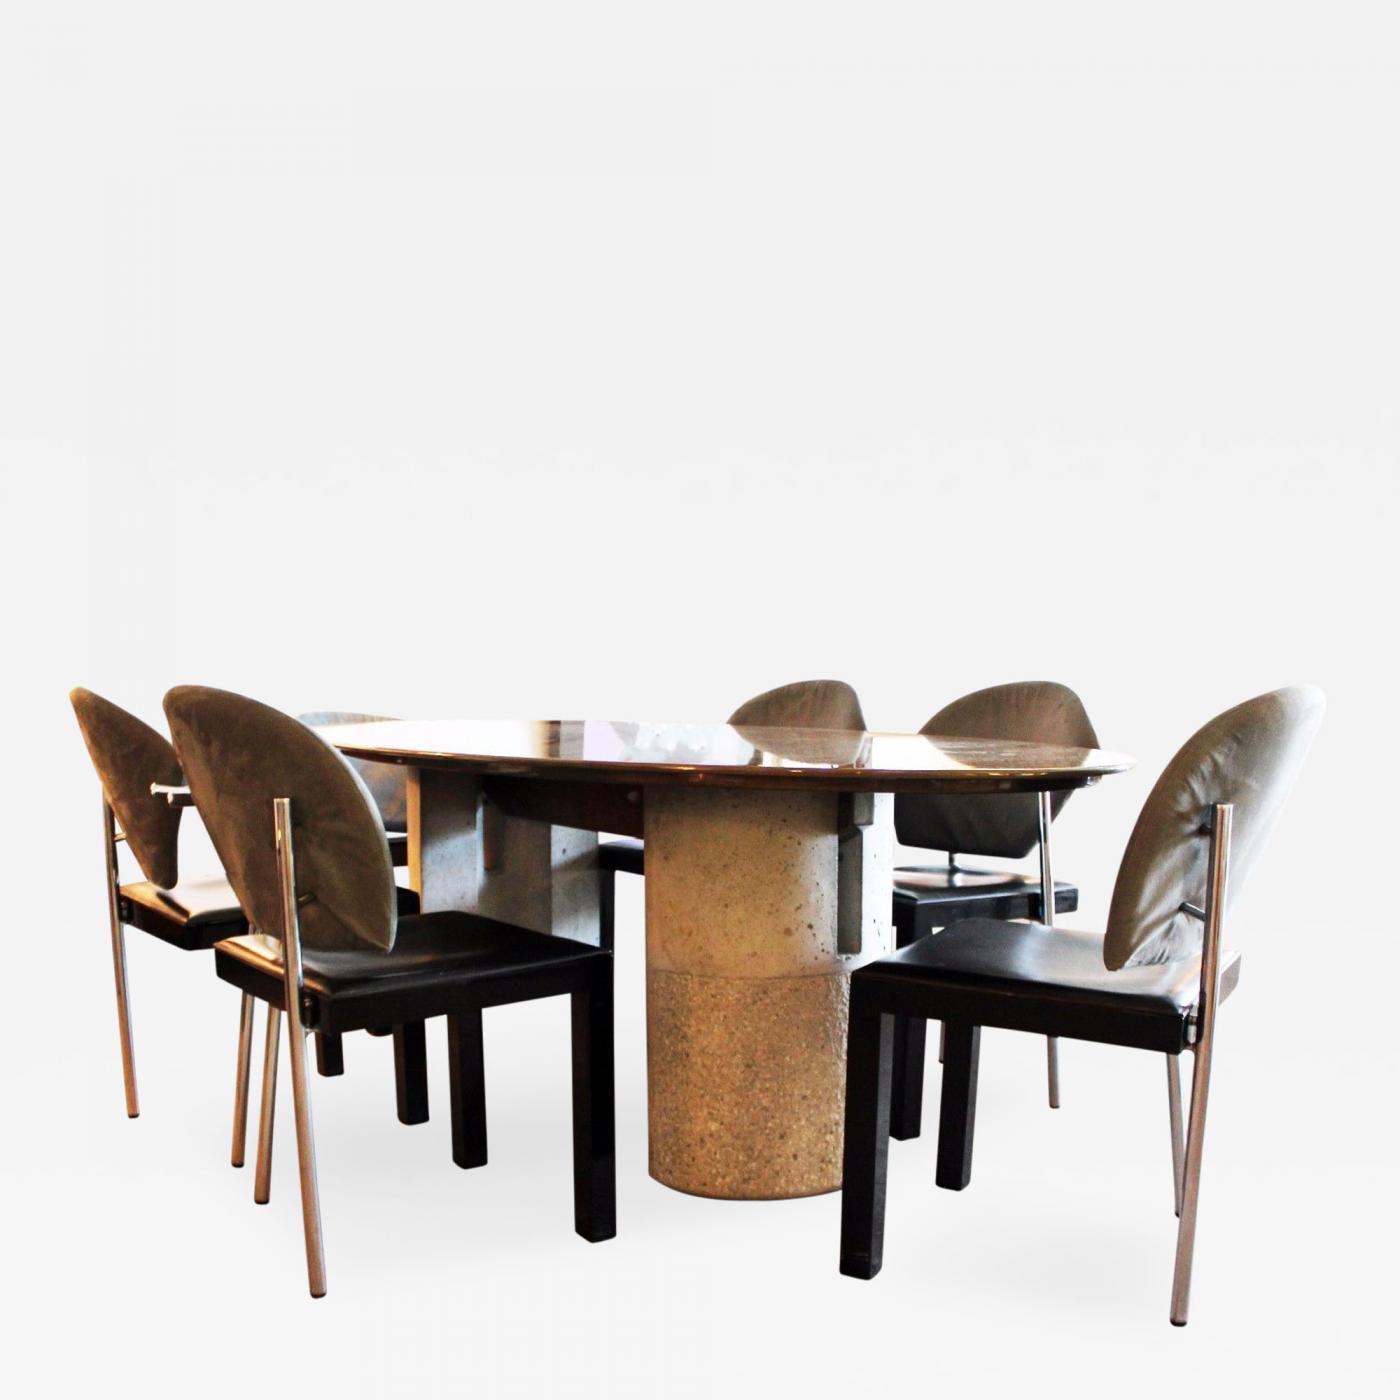 Italian modern dining tables - Listings Furniture Tables Dining Tables Saporiti Mid Century Modern Saporiti Italia Italian